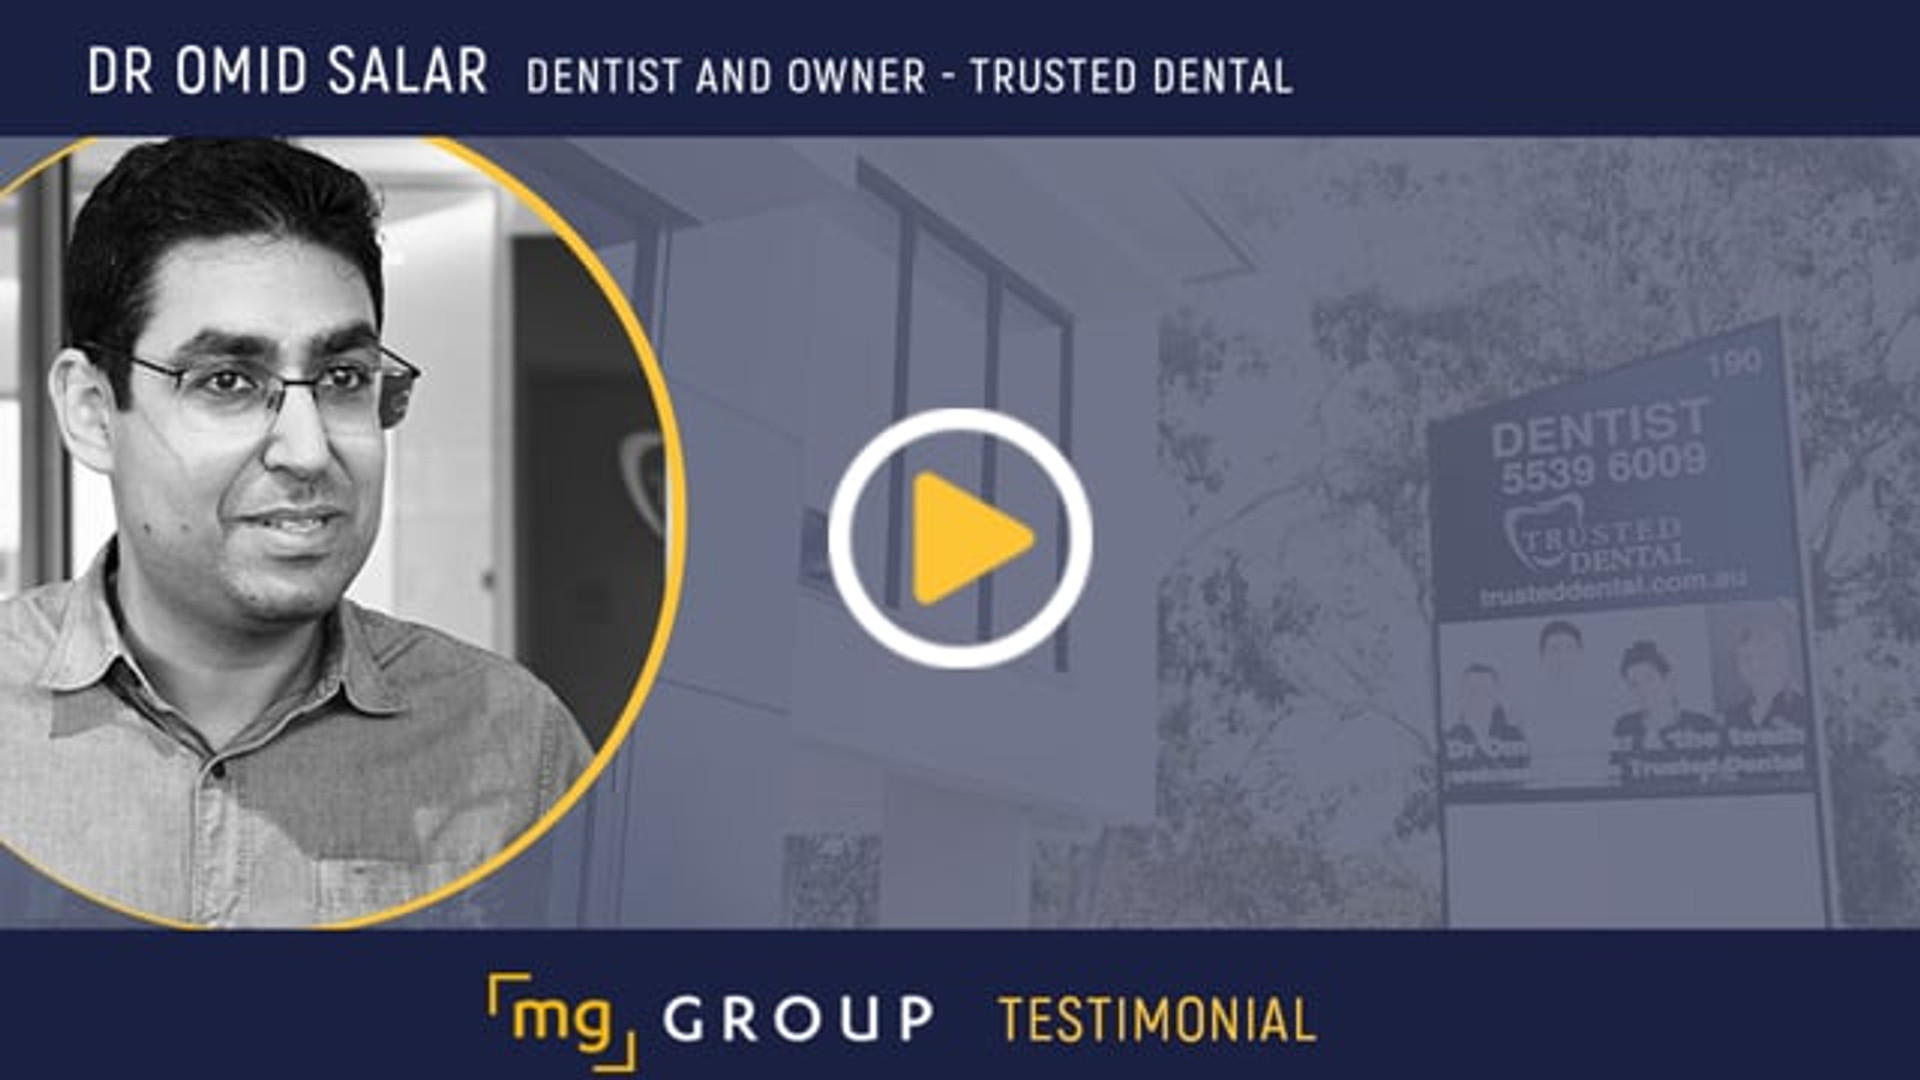 Trusted Dental Testimonial